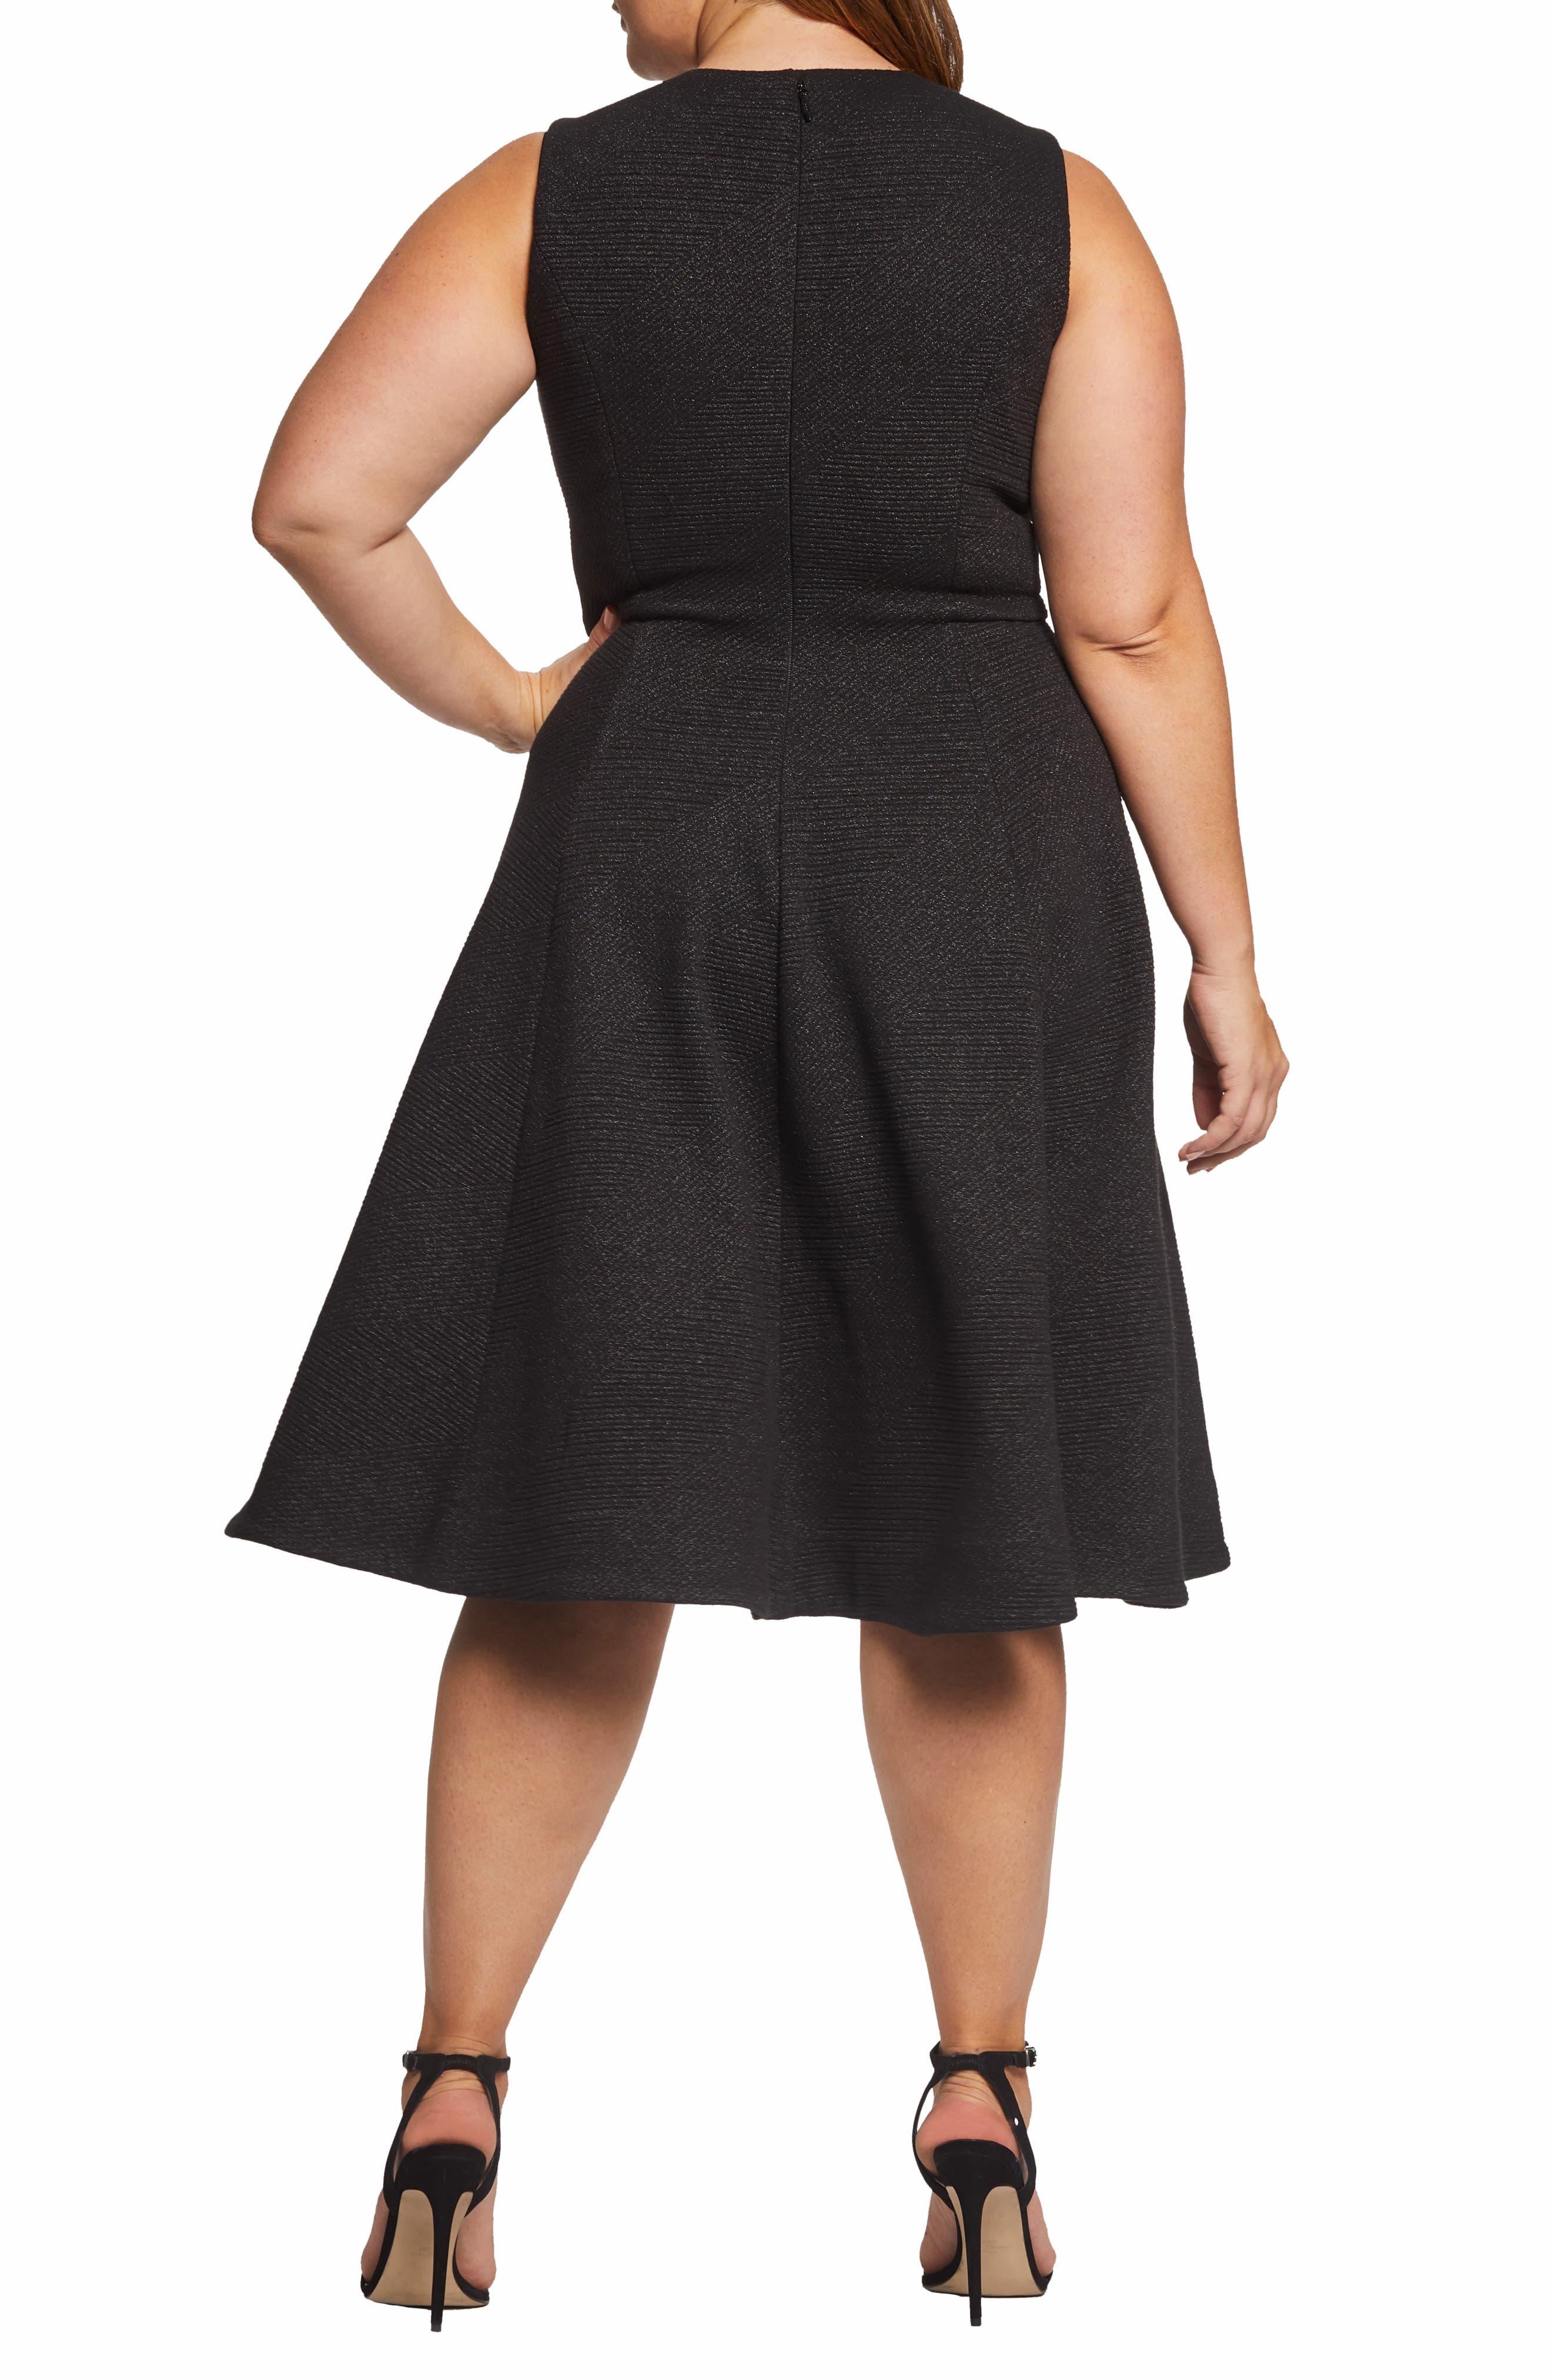 DRESS THE POPULATION, Sleeveless A-Line Dress, Alternate thumbnail 2, color, BLACK